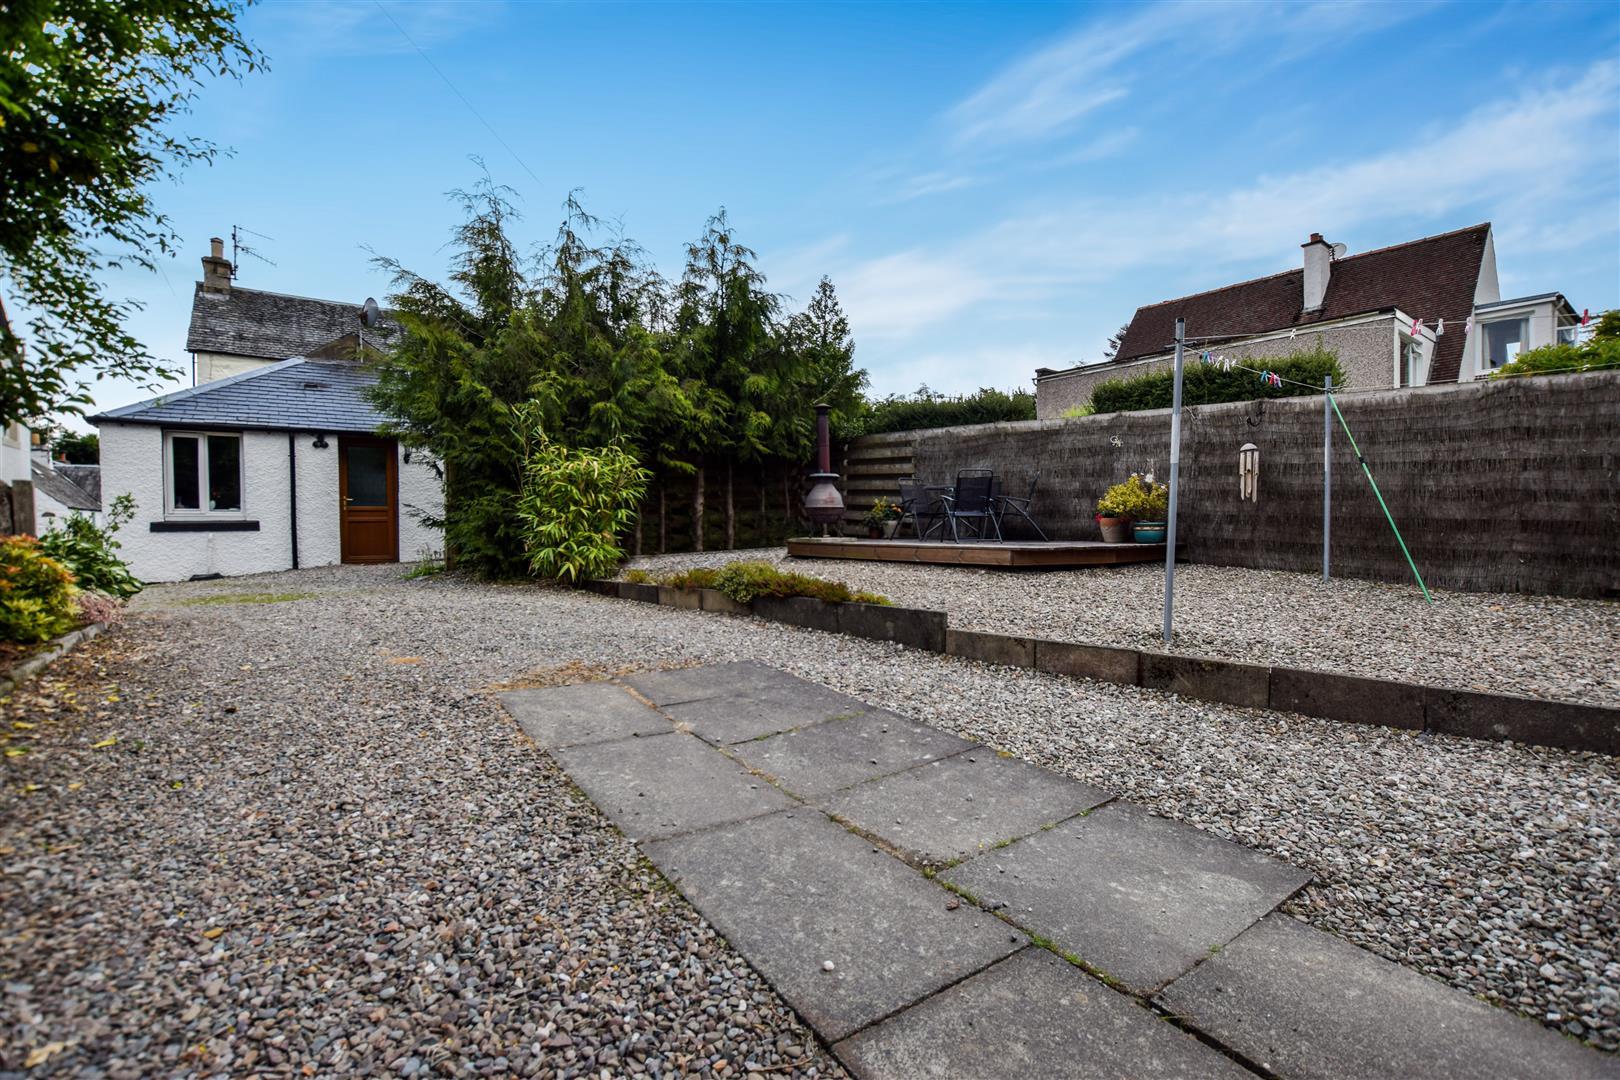 Wallace Grove, Dalginross, Comrie, Perthshire, PH6 2HB, UK